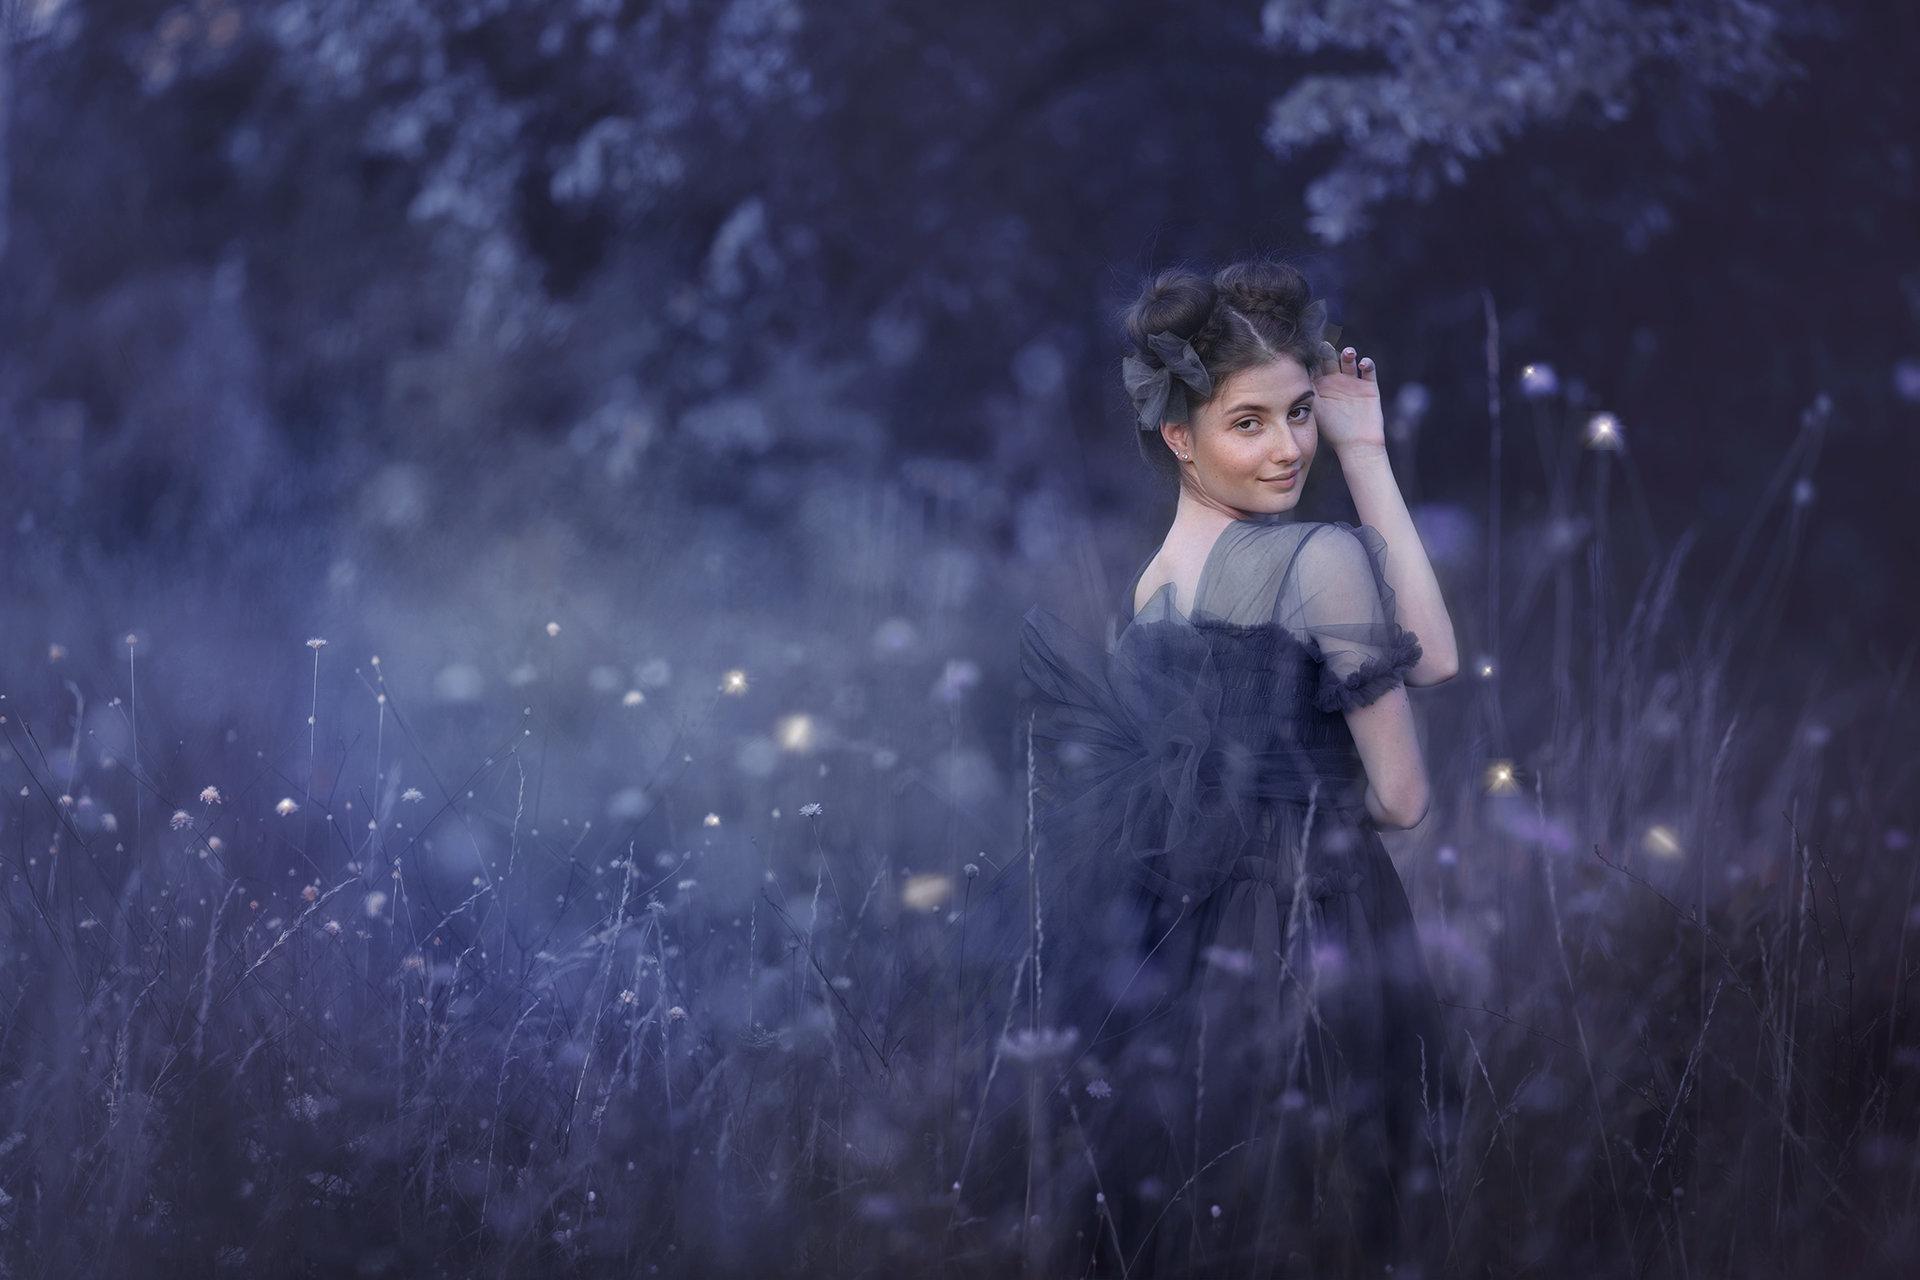 Photo in Portrait | Author Tanq Markova - Nyamarkova | PHOTO FORUM